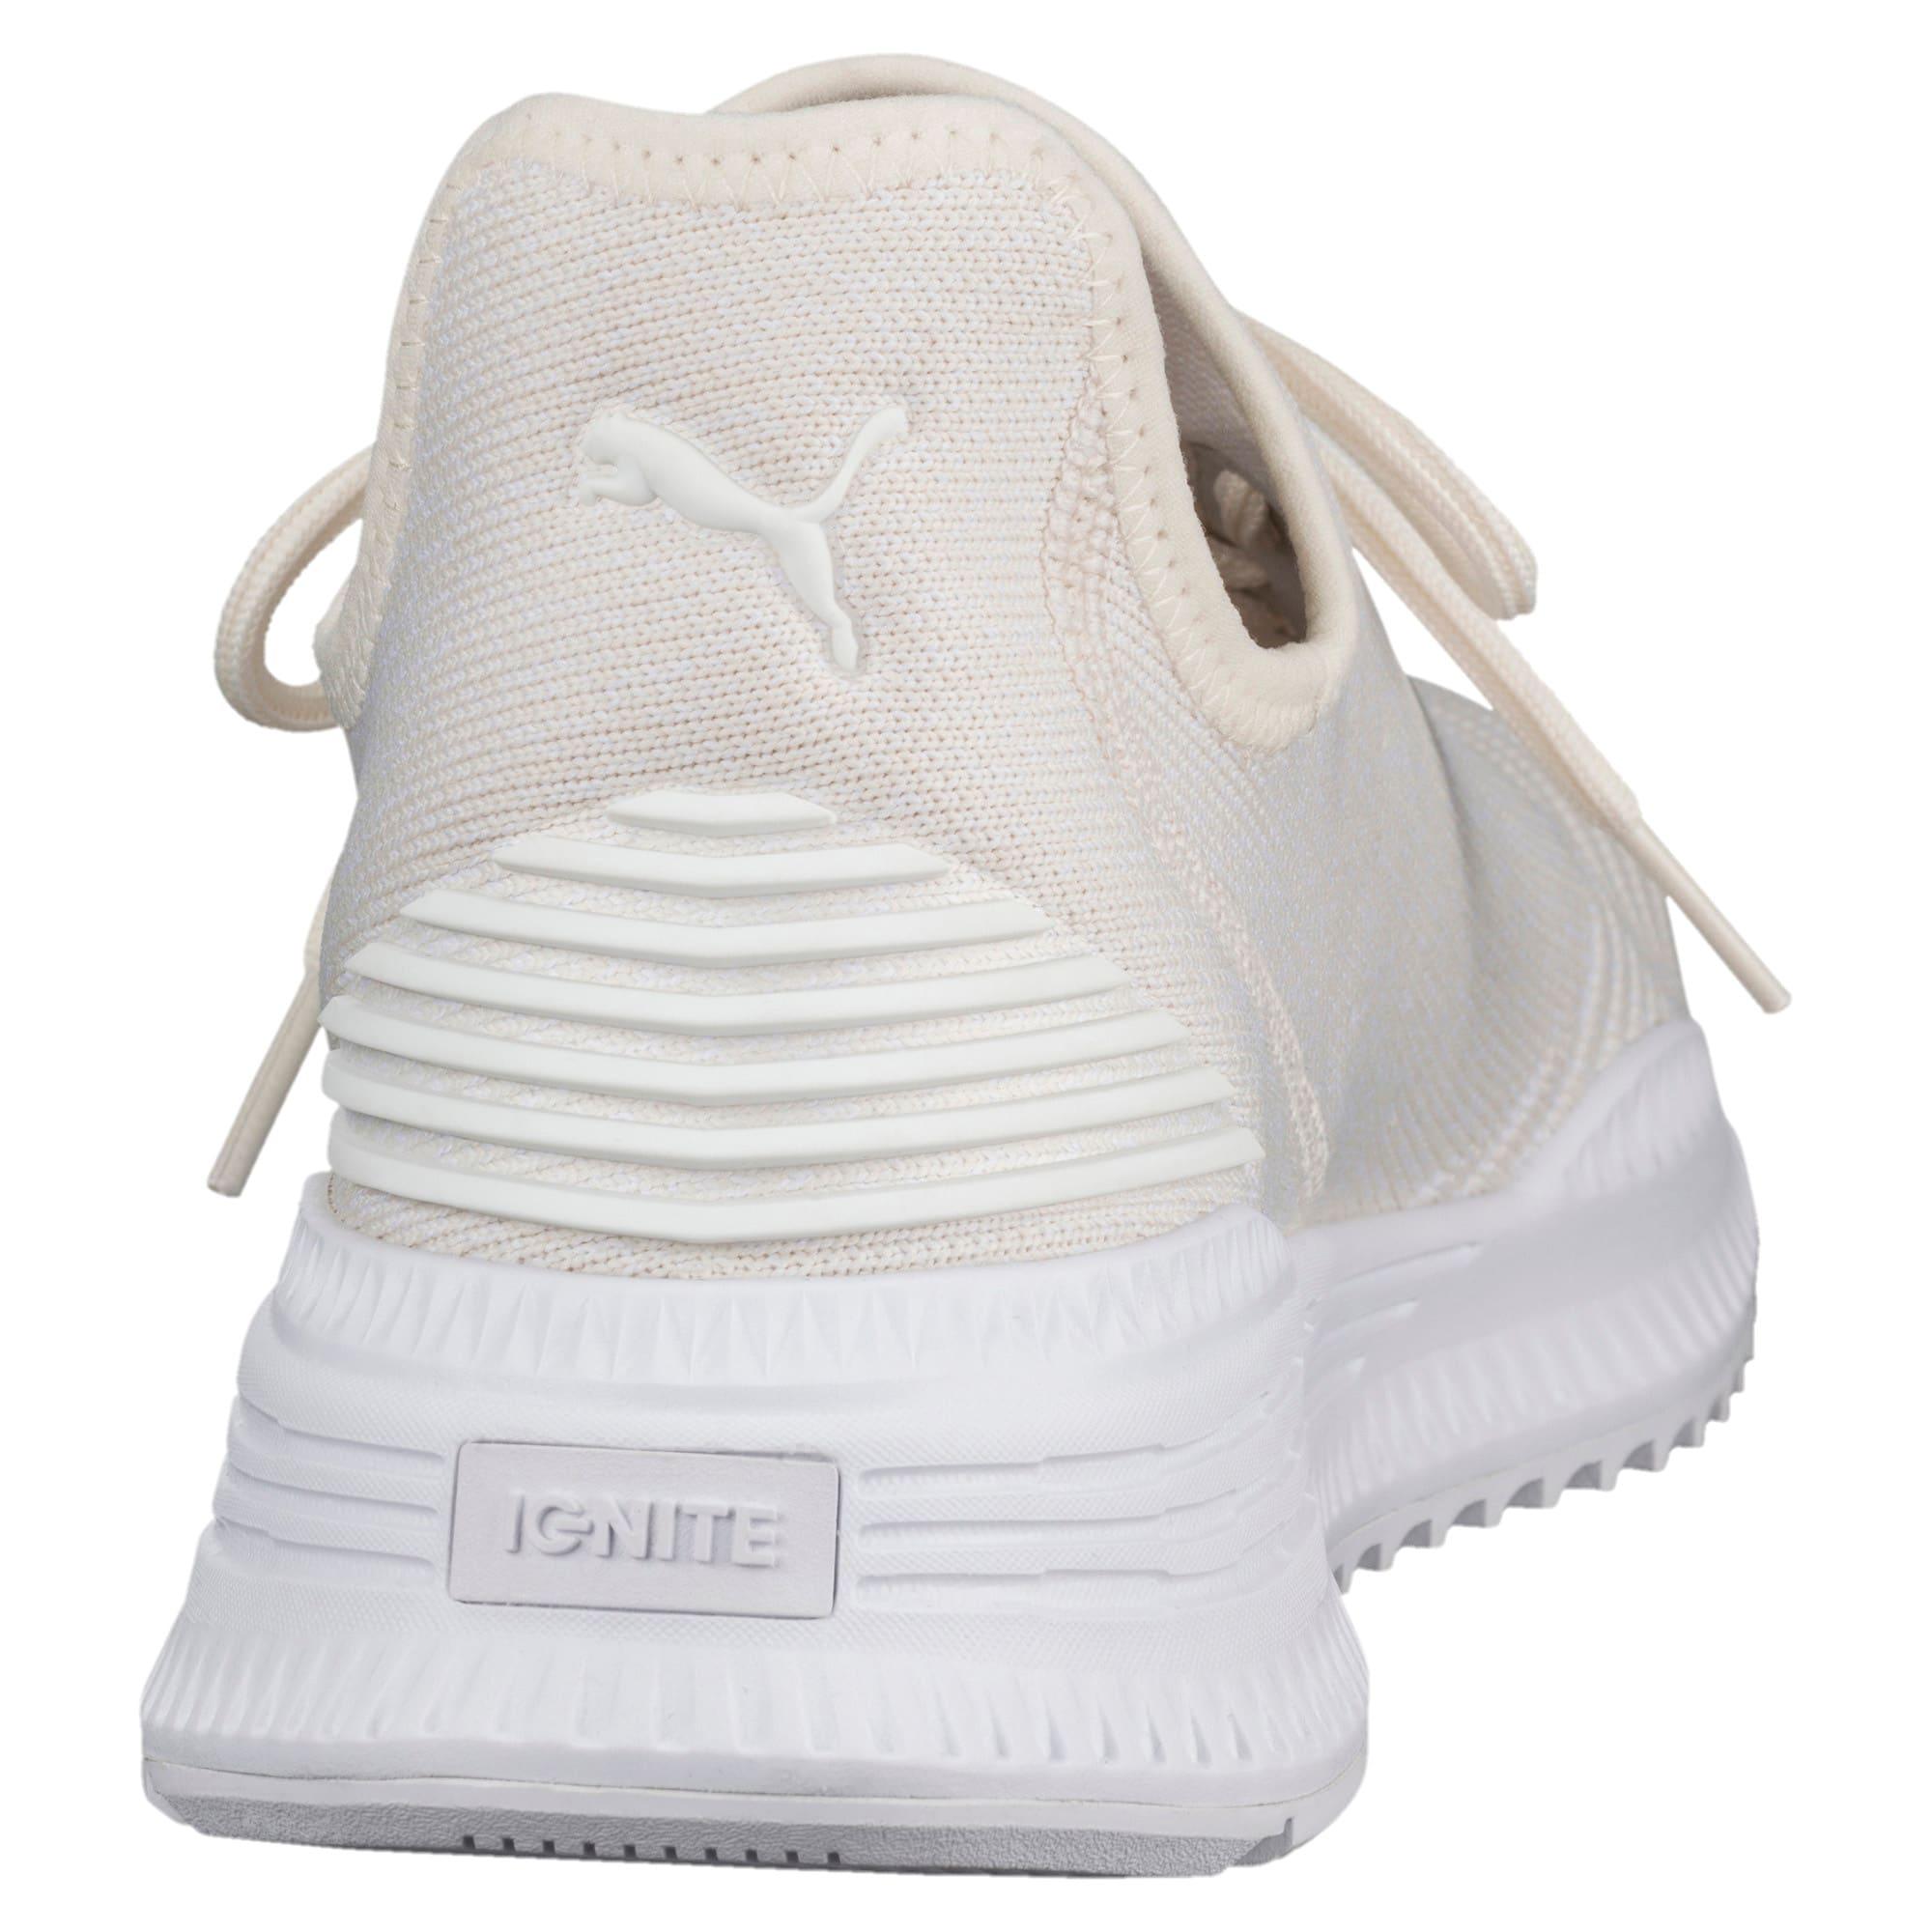 Thumbnail 4 of AVID Men's Sneakers, Whisper White-Puma White, medium